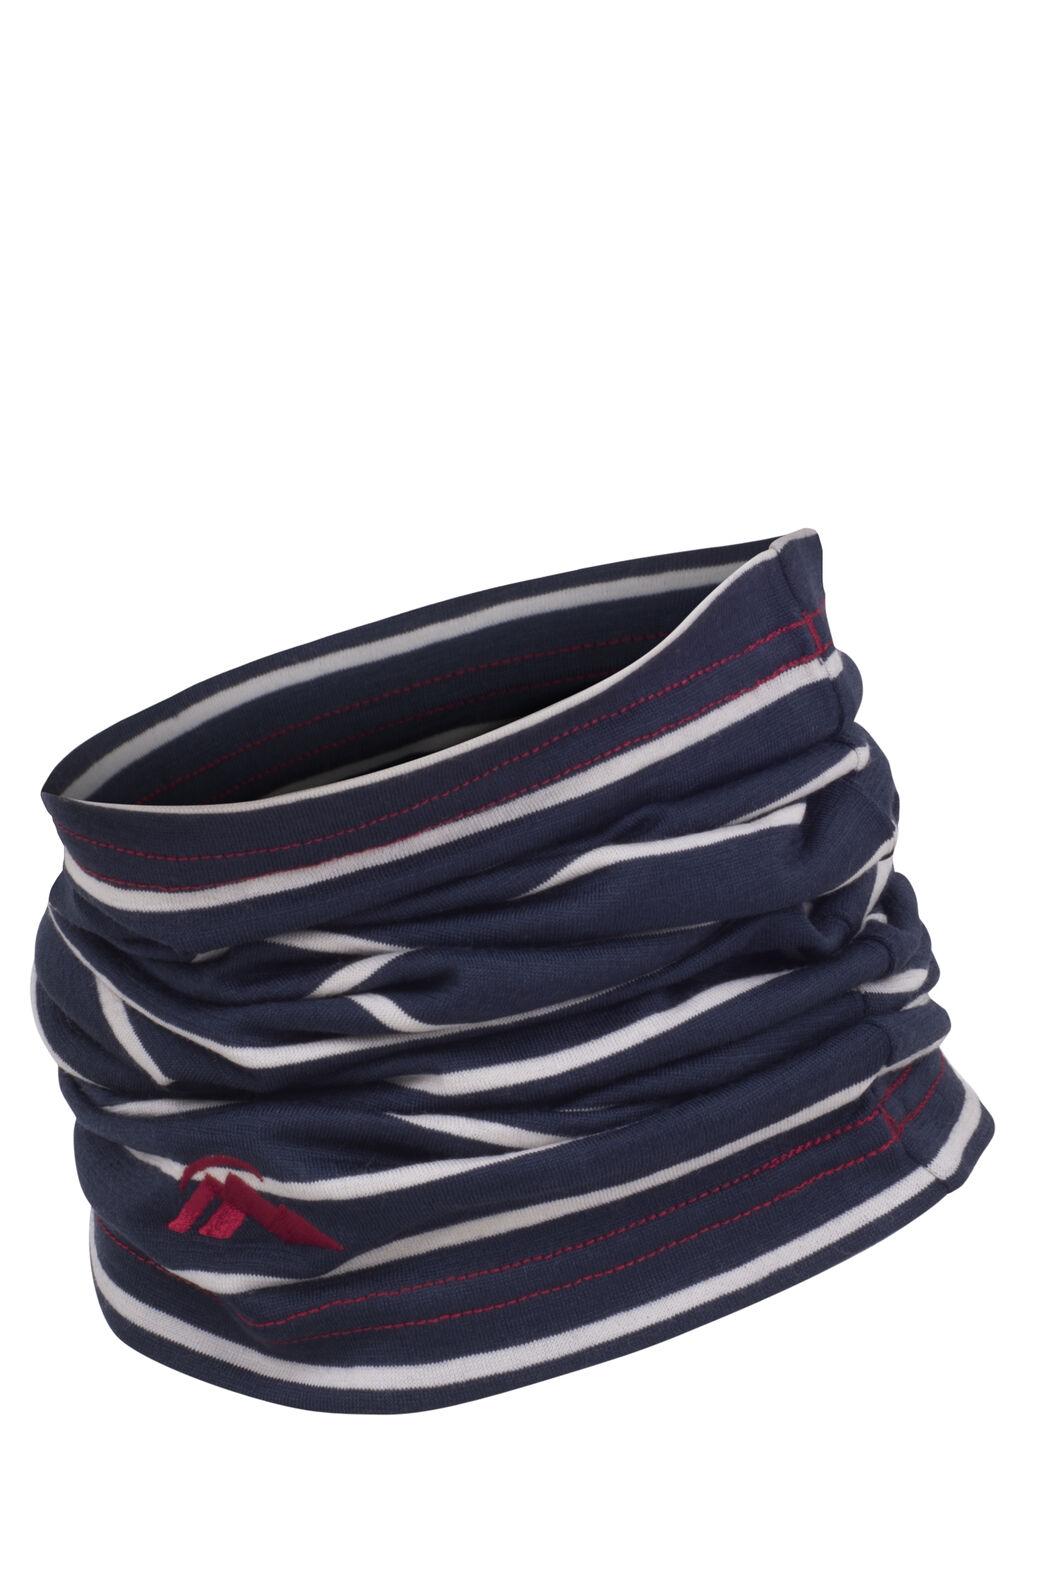 Macpac Merino 150 Neck Gaiter, Black Iris Stripe, hi-res